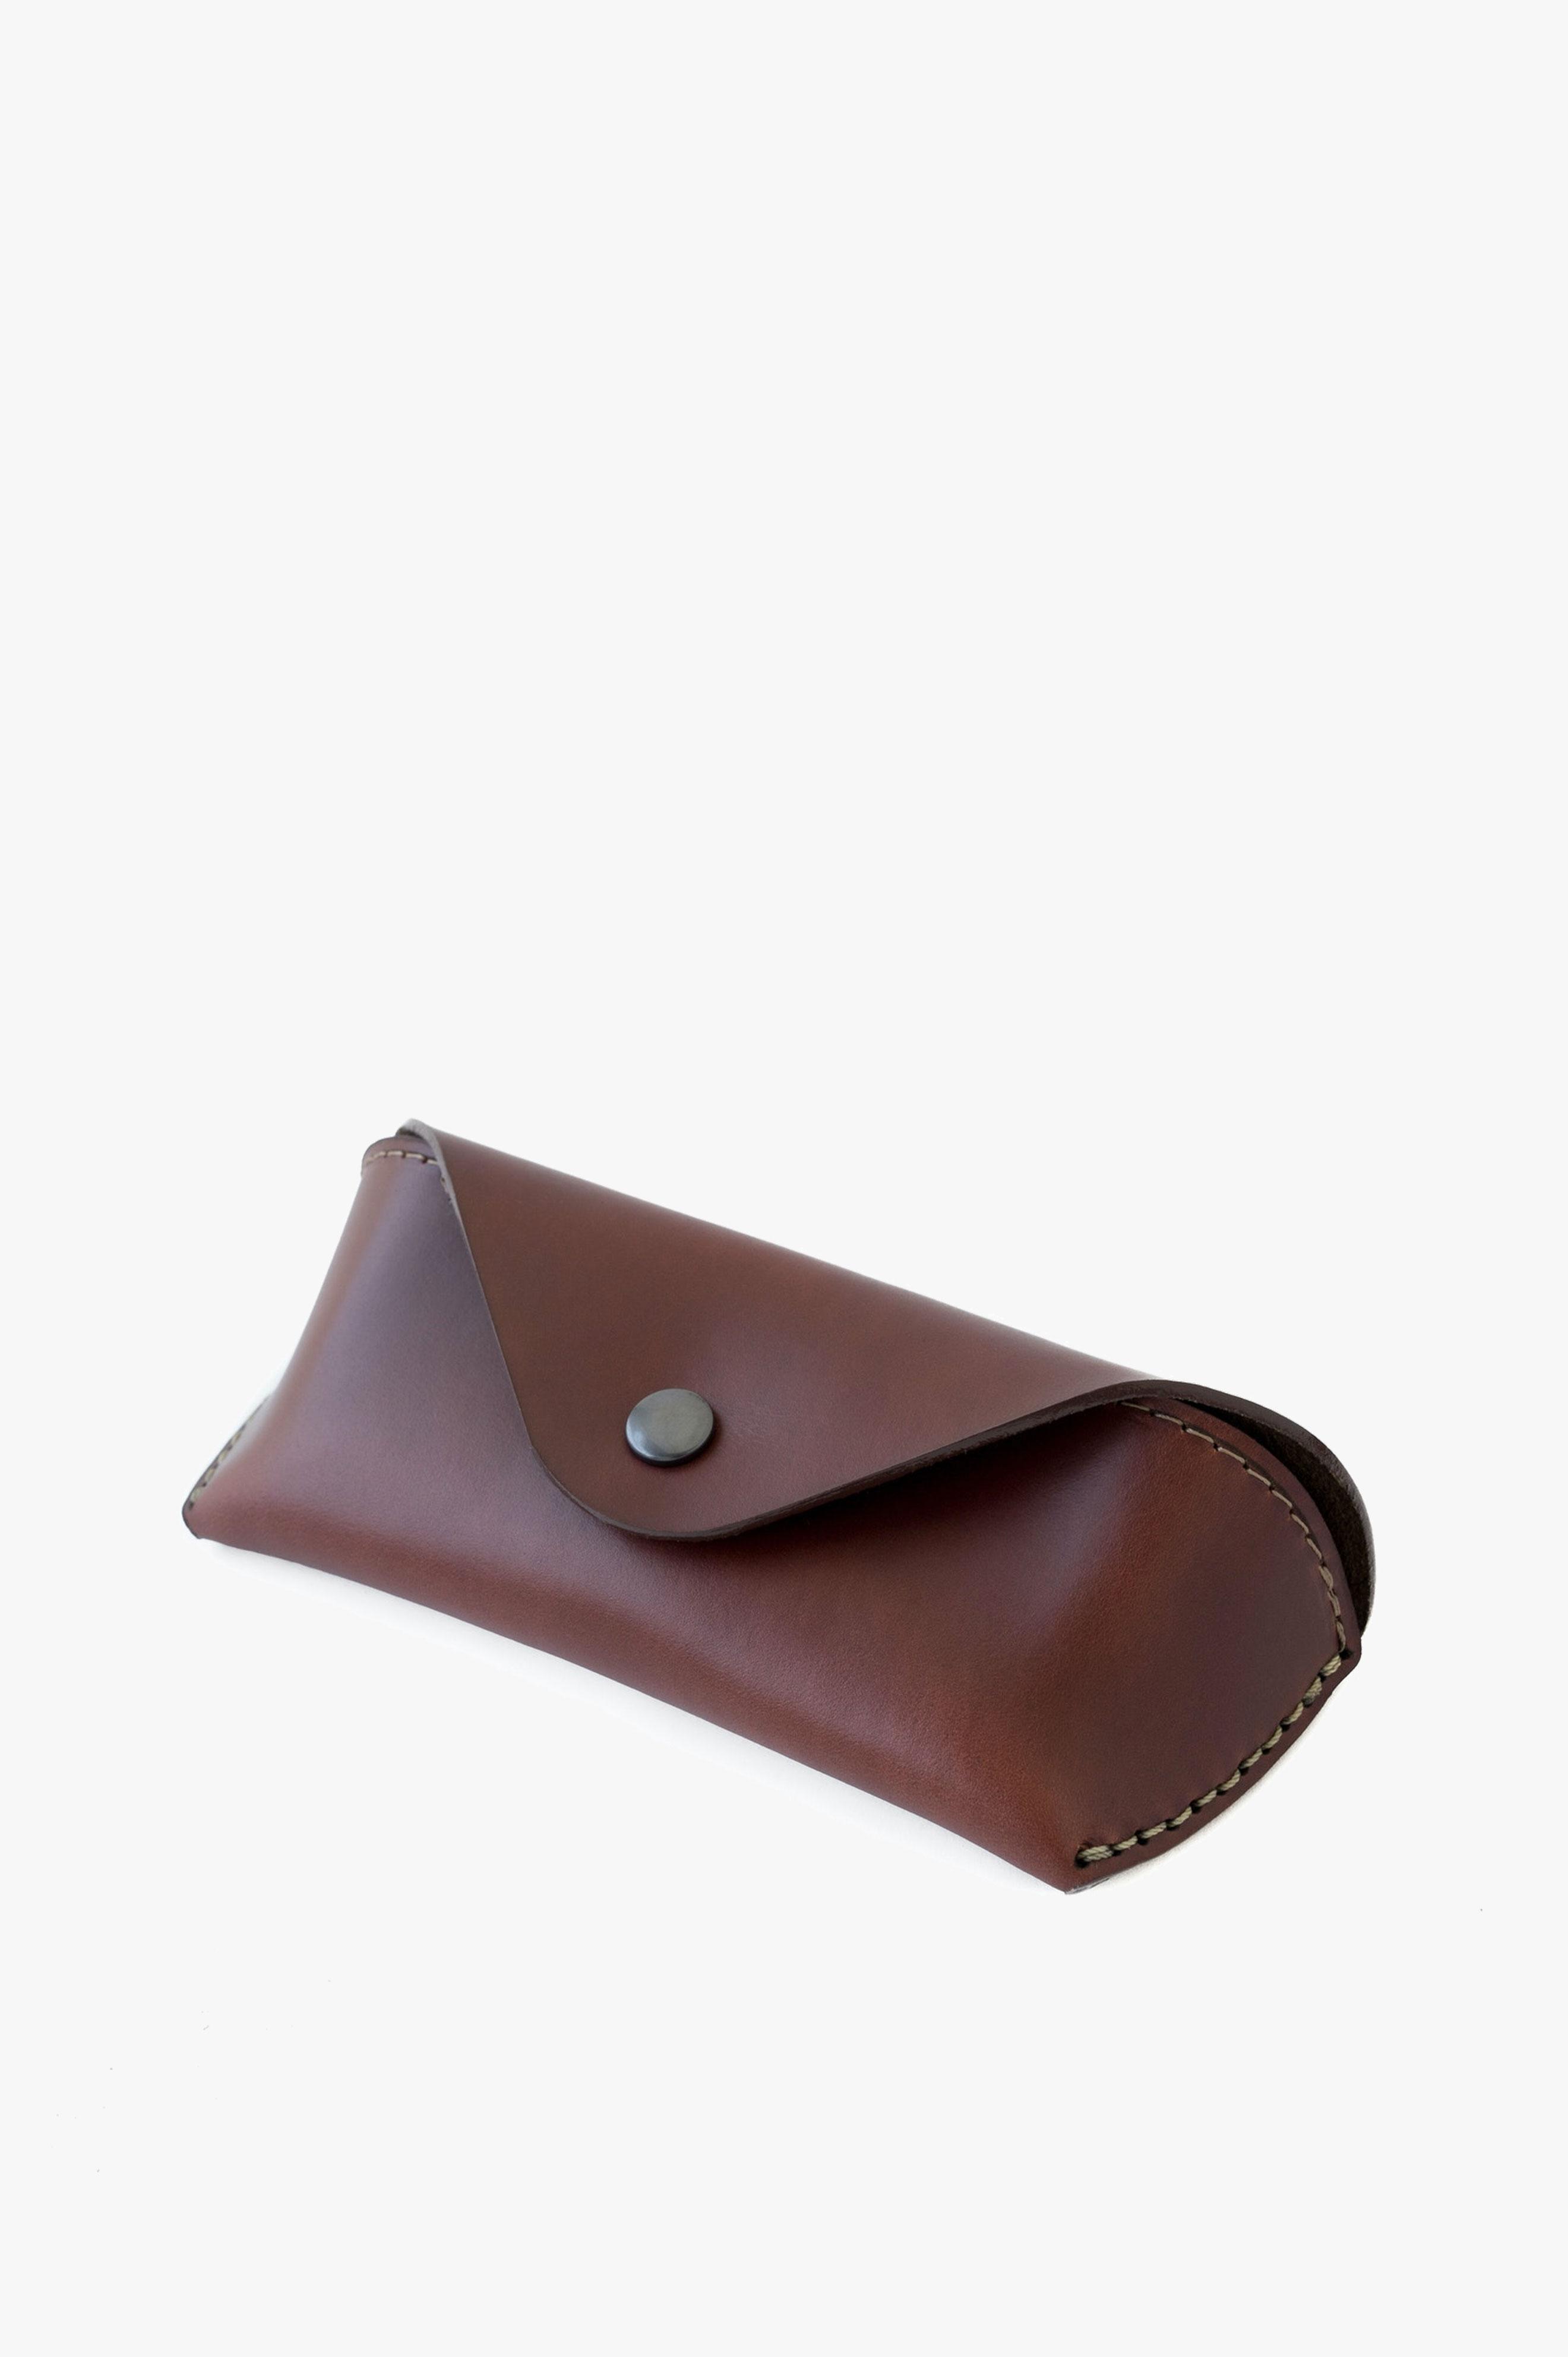 Eyewear Case Ox Blood Horween® Chromexcel Leather